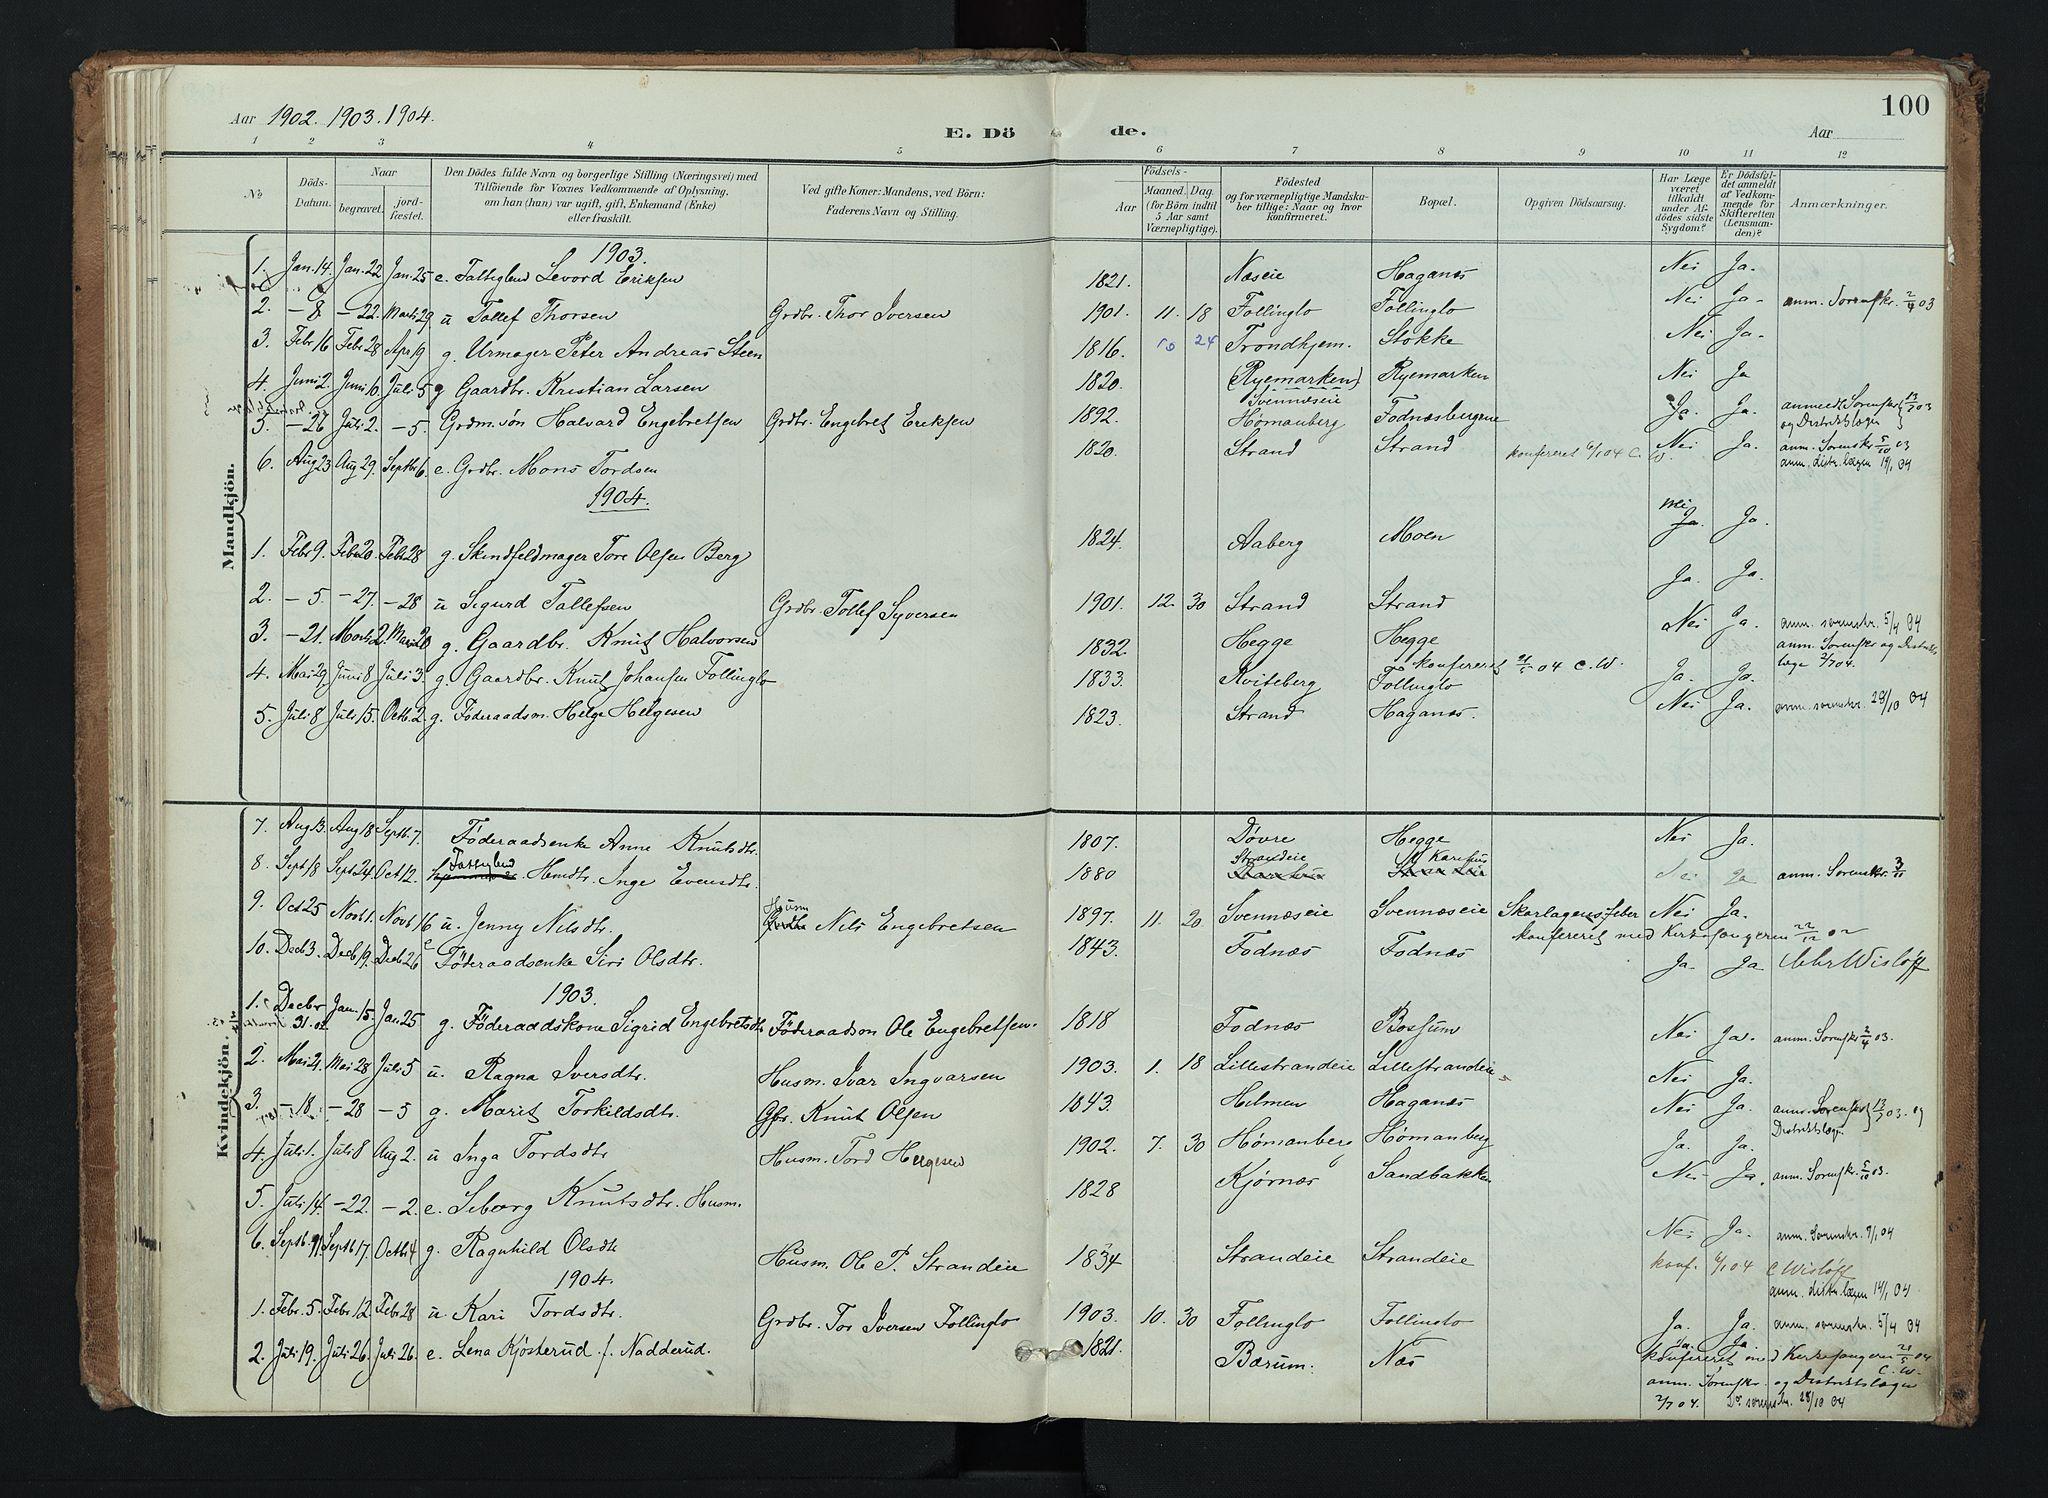 SAH, Nord-Aurdal prestekontor, Ministerialbok nr. 16, 1897-1925, s. 100